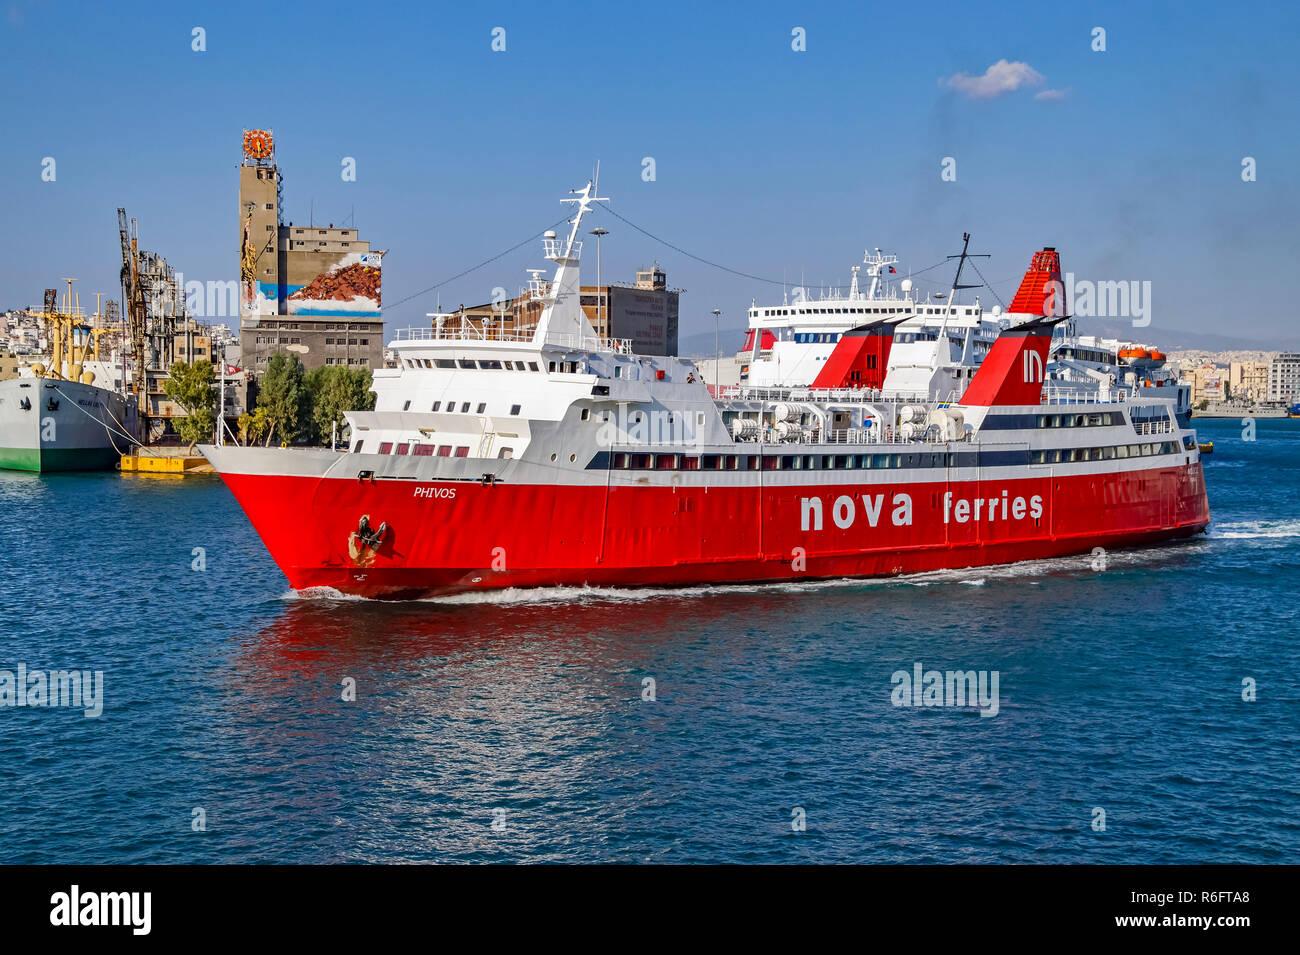 Nova ferries phivos in port of Piraeus Athens Greece Europe - Stock Image